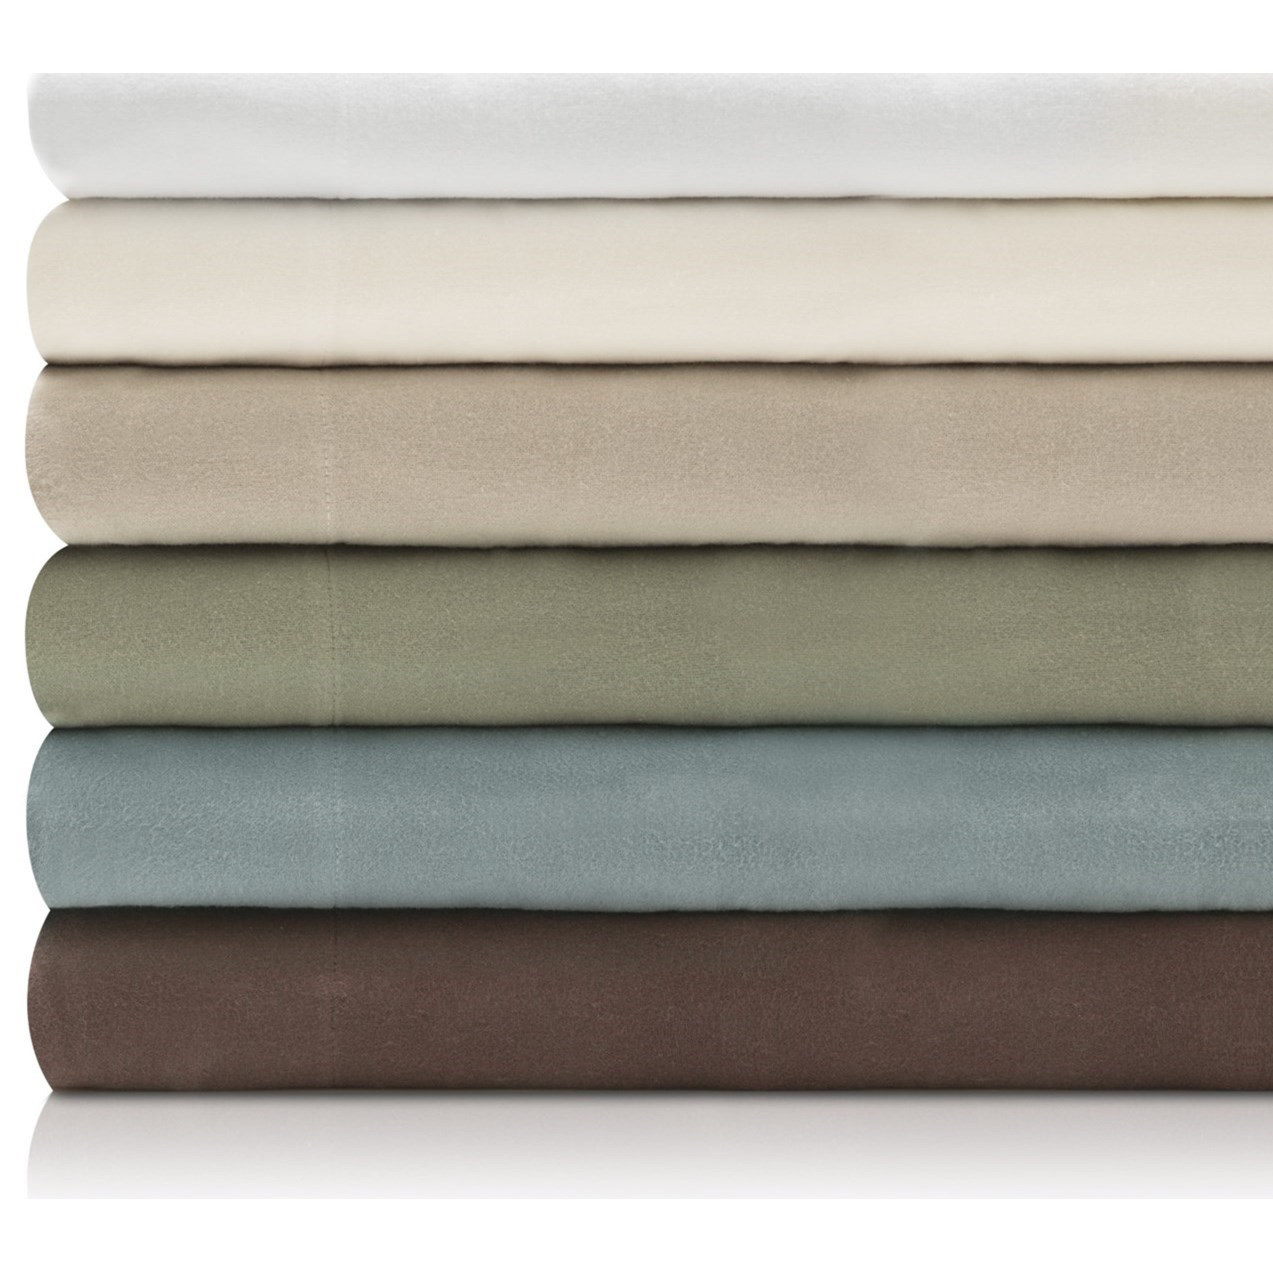 Malouf Portuguese Flannel Split King Woven™ Portuguese Flannel Sheet S - Item Number: WO19SKOAFS